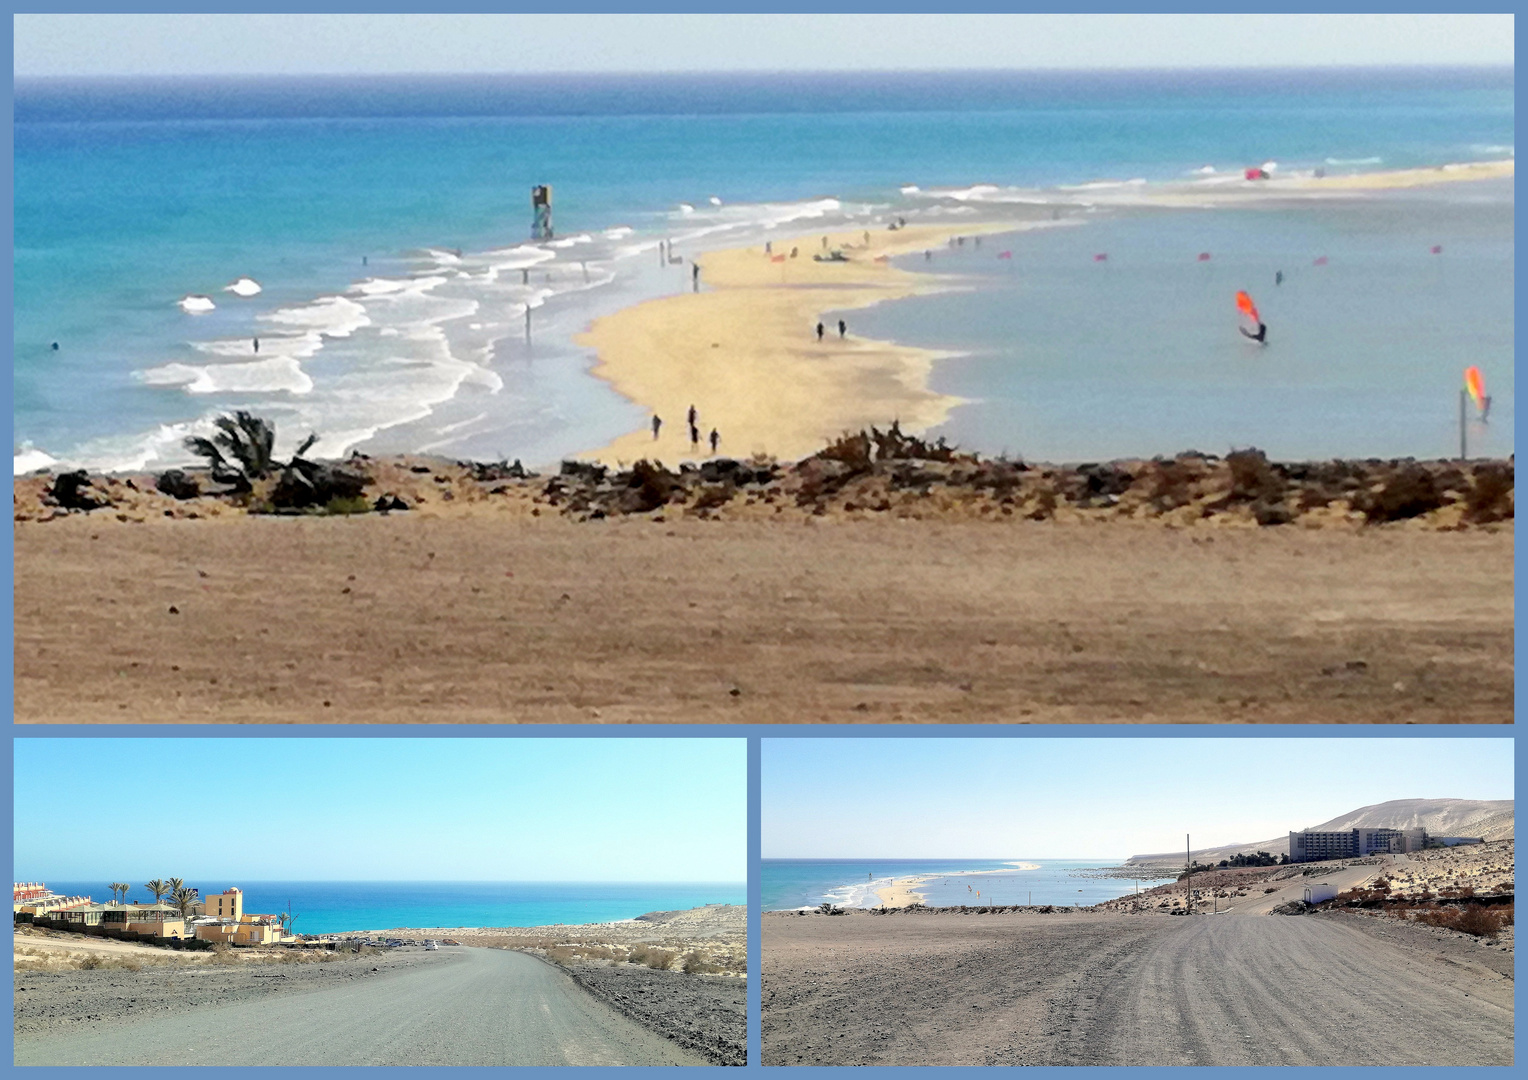 playa de Sotavento de Jandia, Fuerteventura